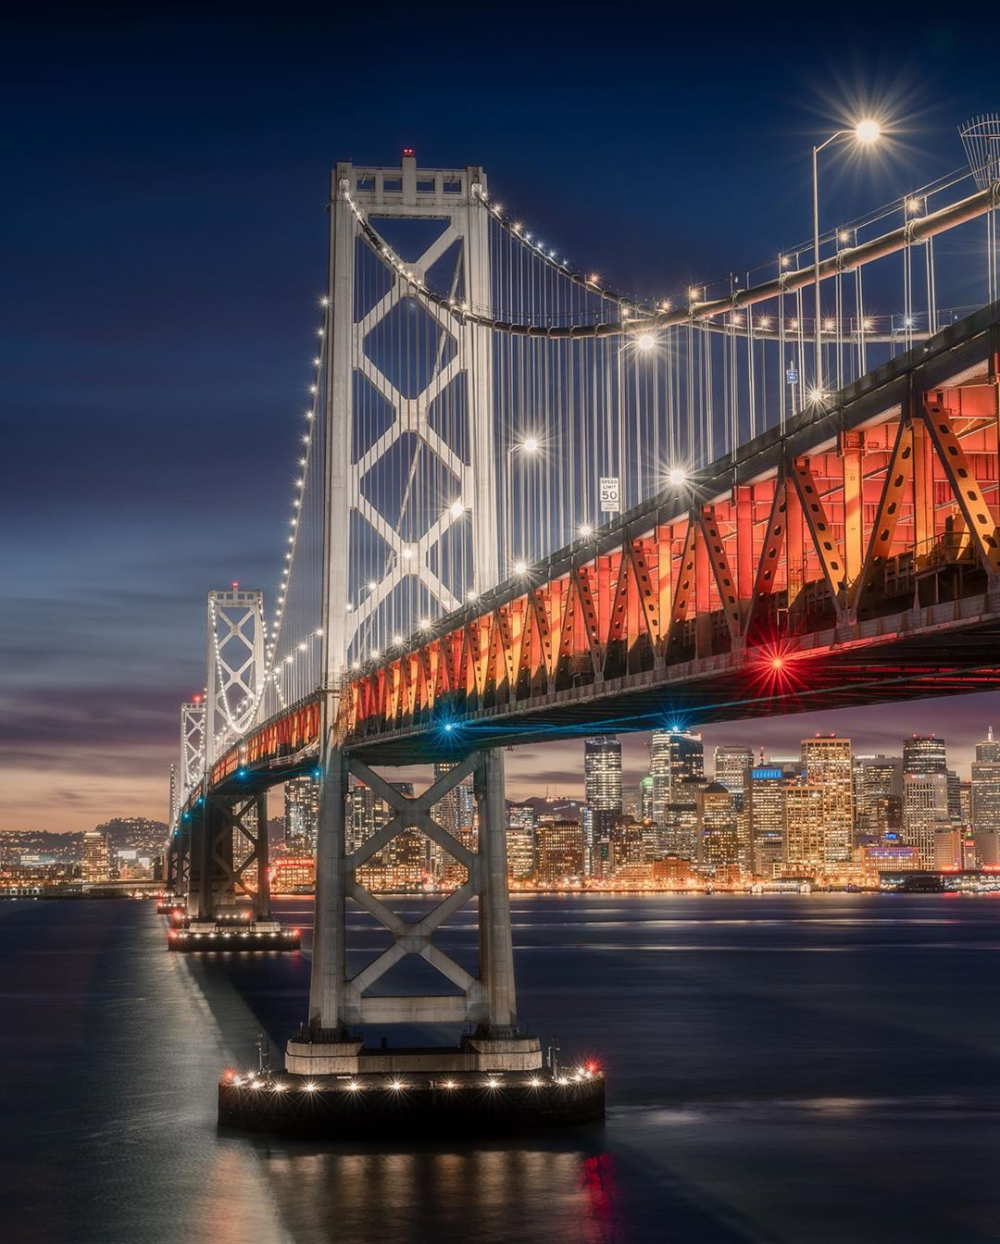 Bay Bridge San Francisco California By Michael Sidofsky Mindz Eye On Instagram San Francisco At Night Bay Bridge San Francisco Bay Bridge